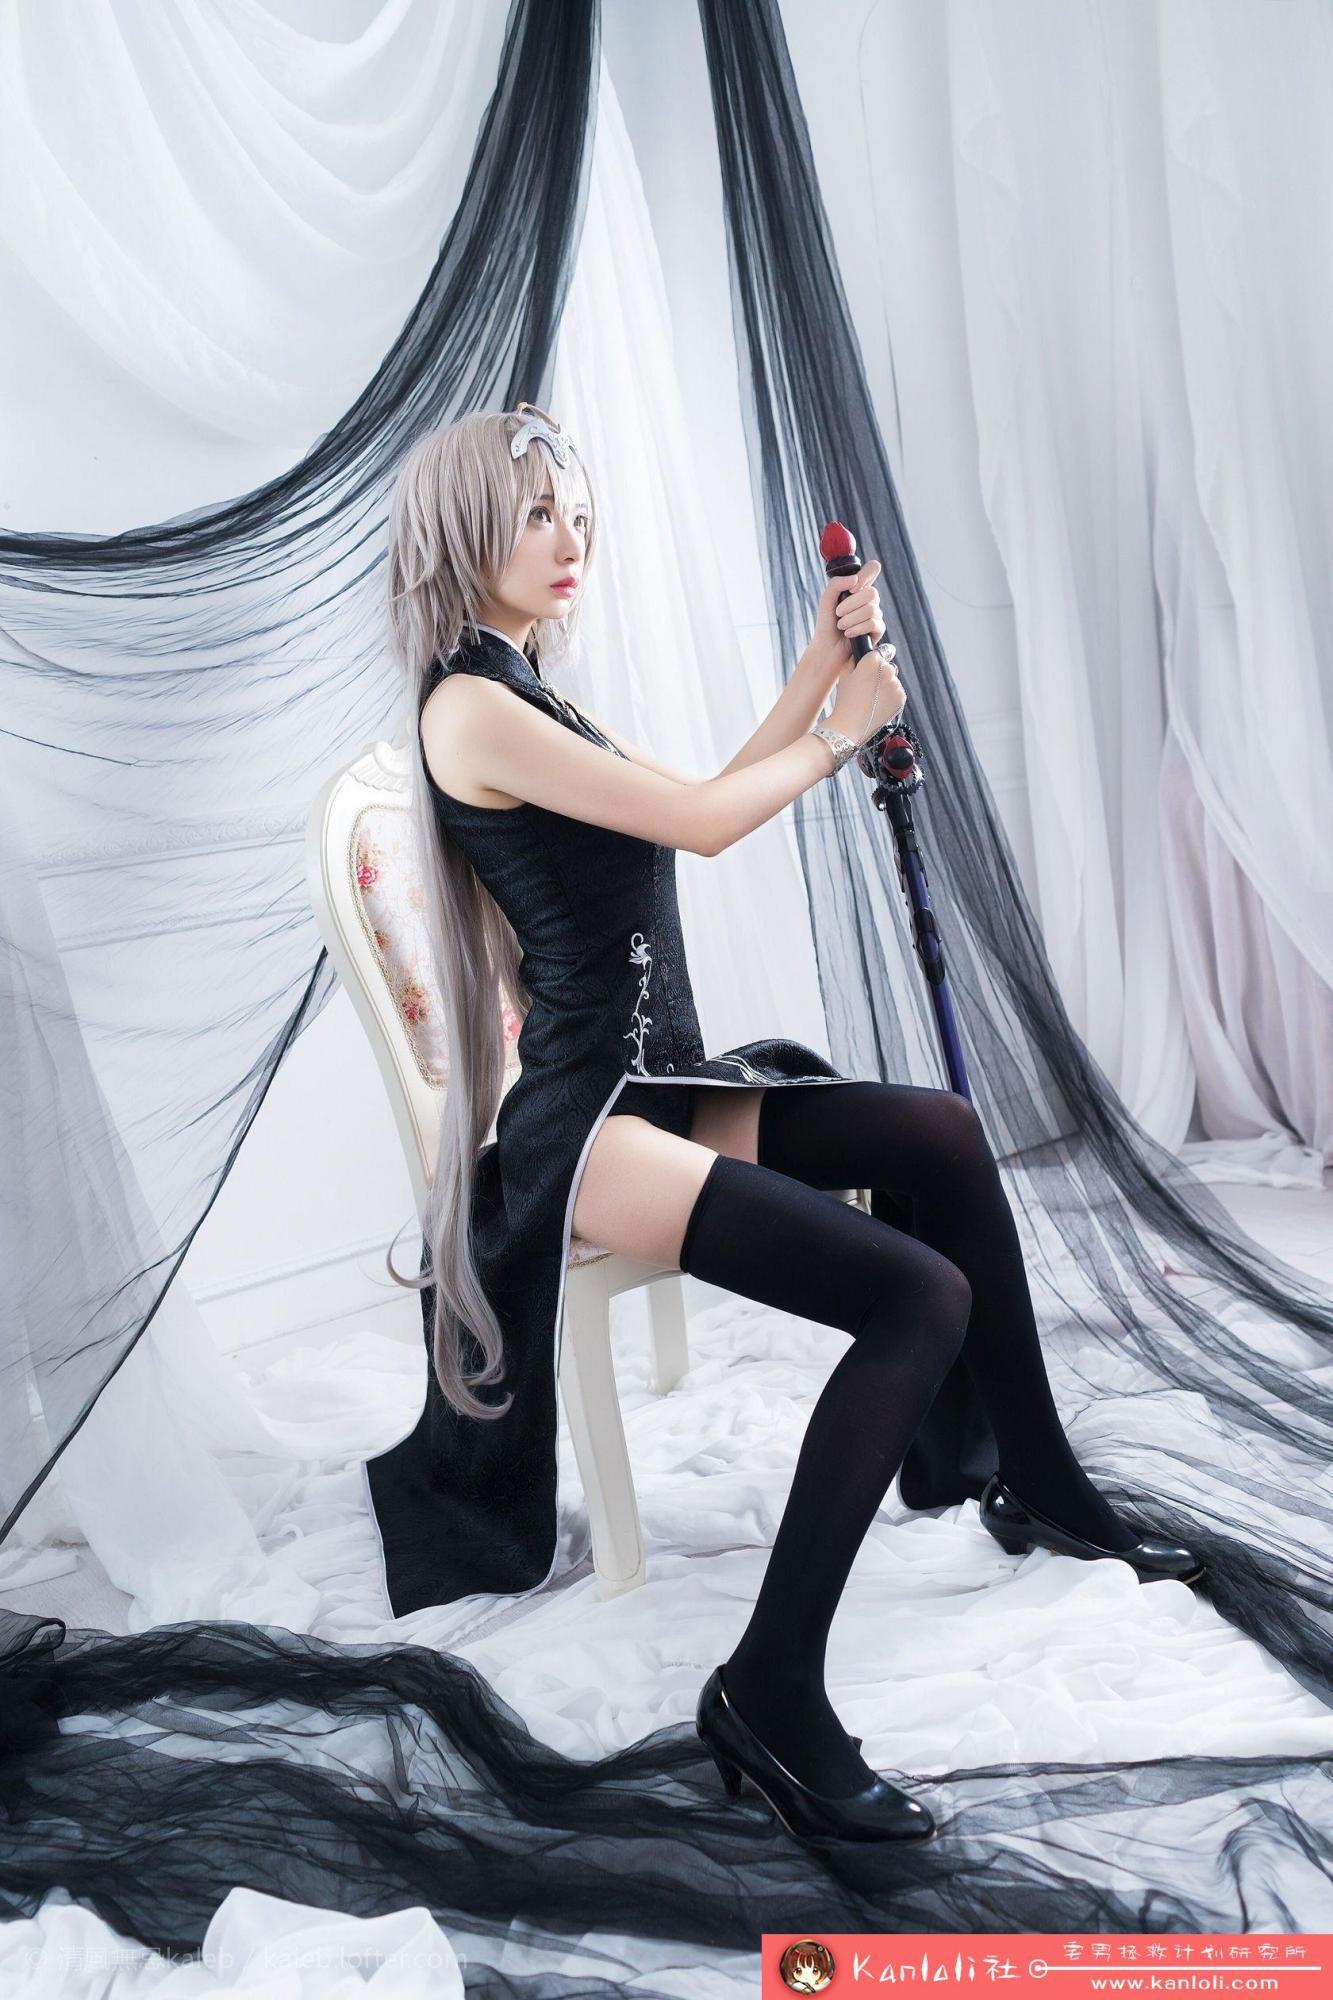 【疯猫ss】疯猫ss写真-FM-014 cosplay御姐风范 [9P]